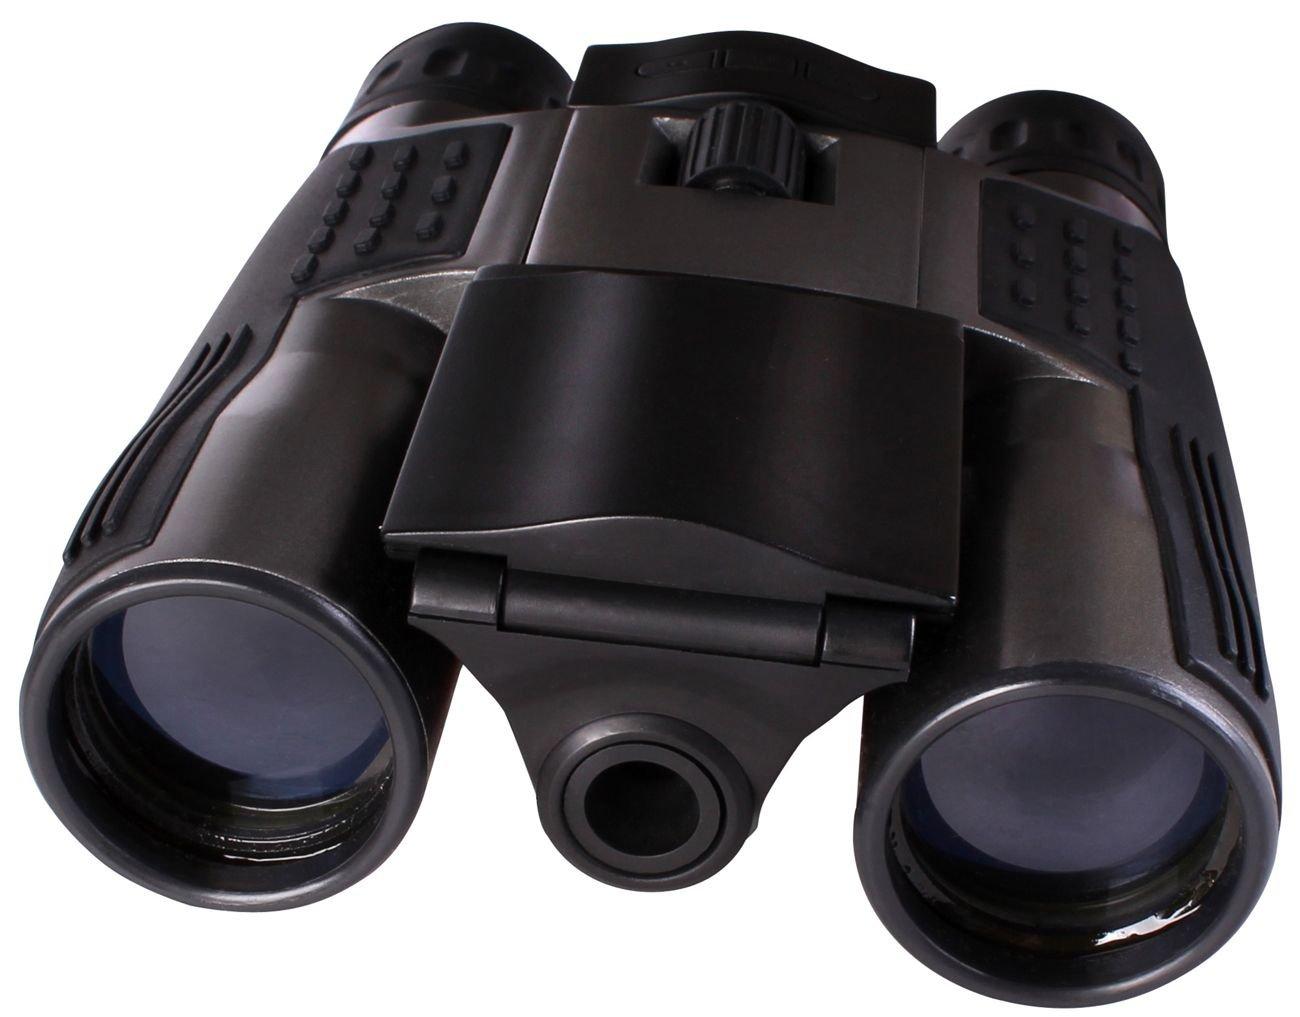 Vivitar 12 Megapixels Camera,Binoculars Kit